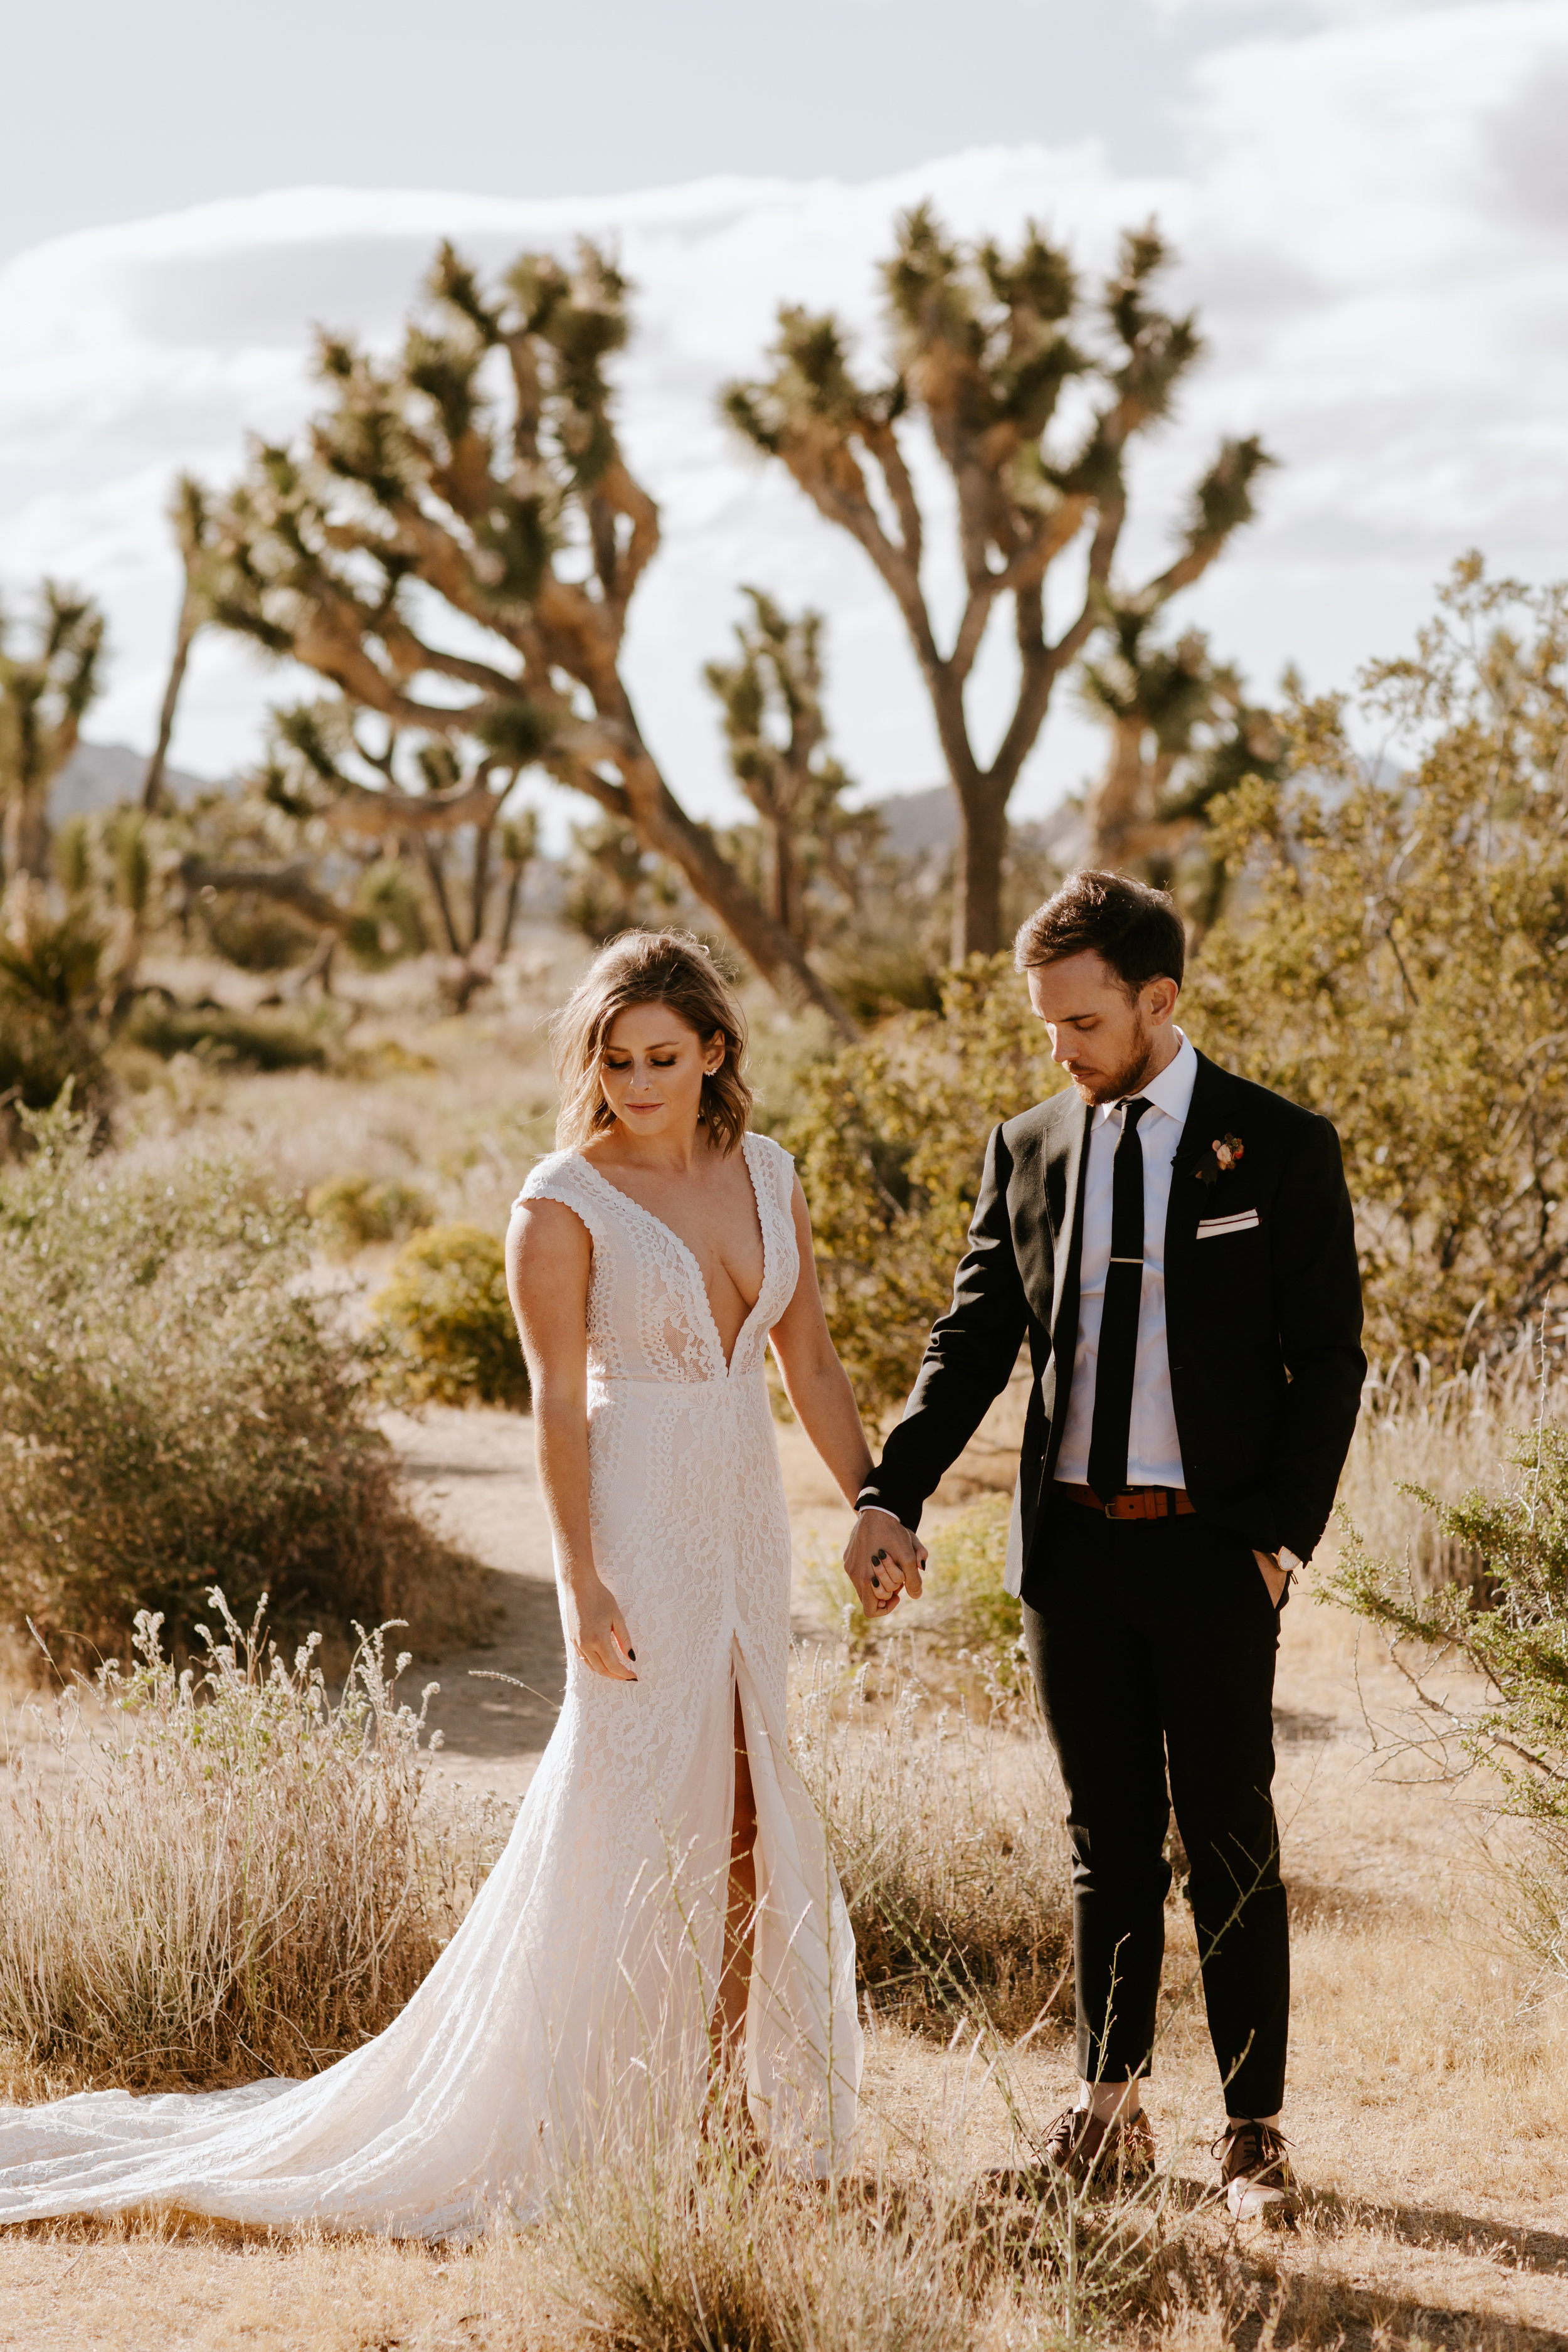 2019-05-26_Callie-Evan_Wedding_Joshua Tree_Paige Nelson_PREVIEWS HR-42.jpg